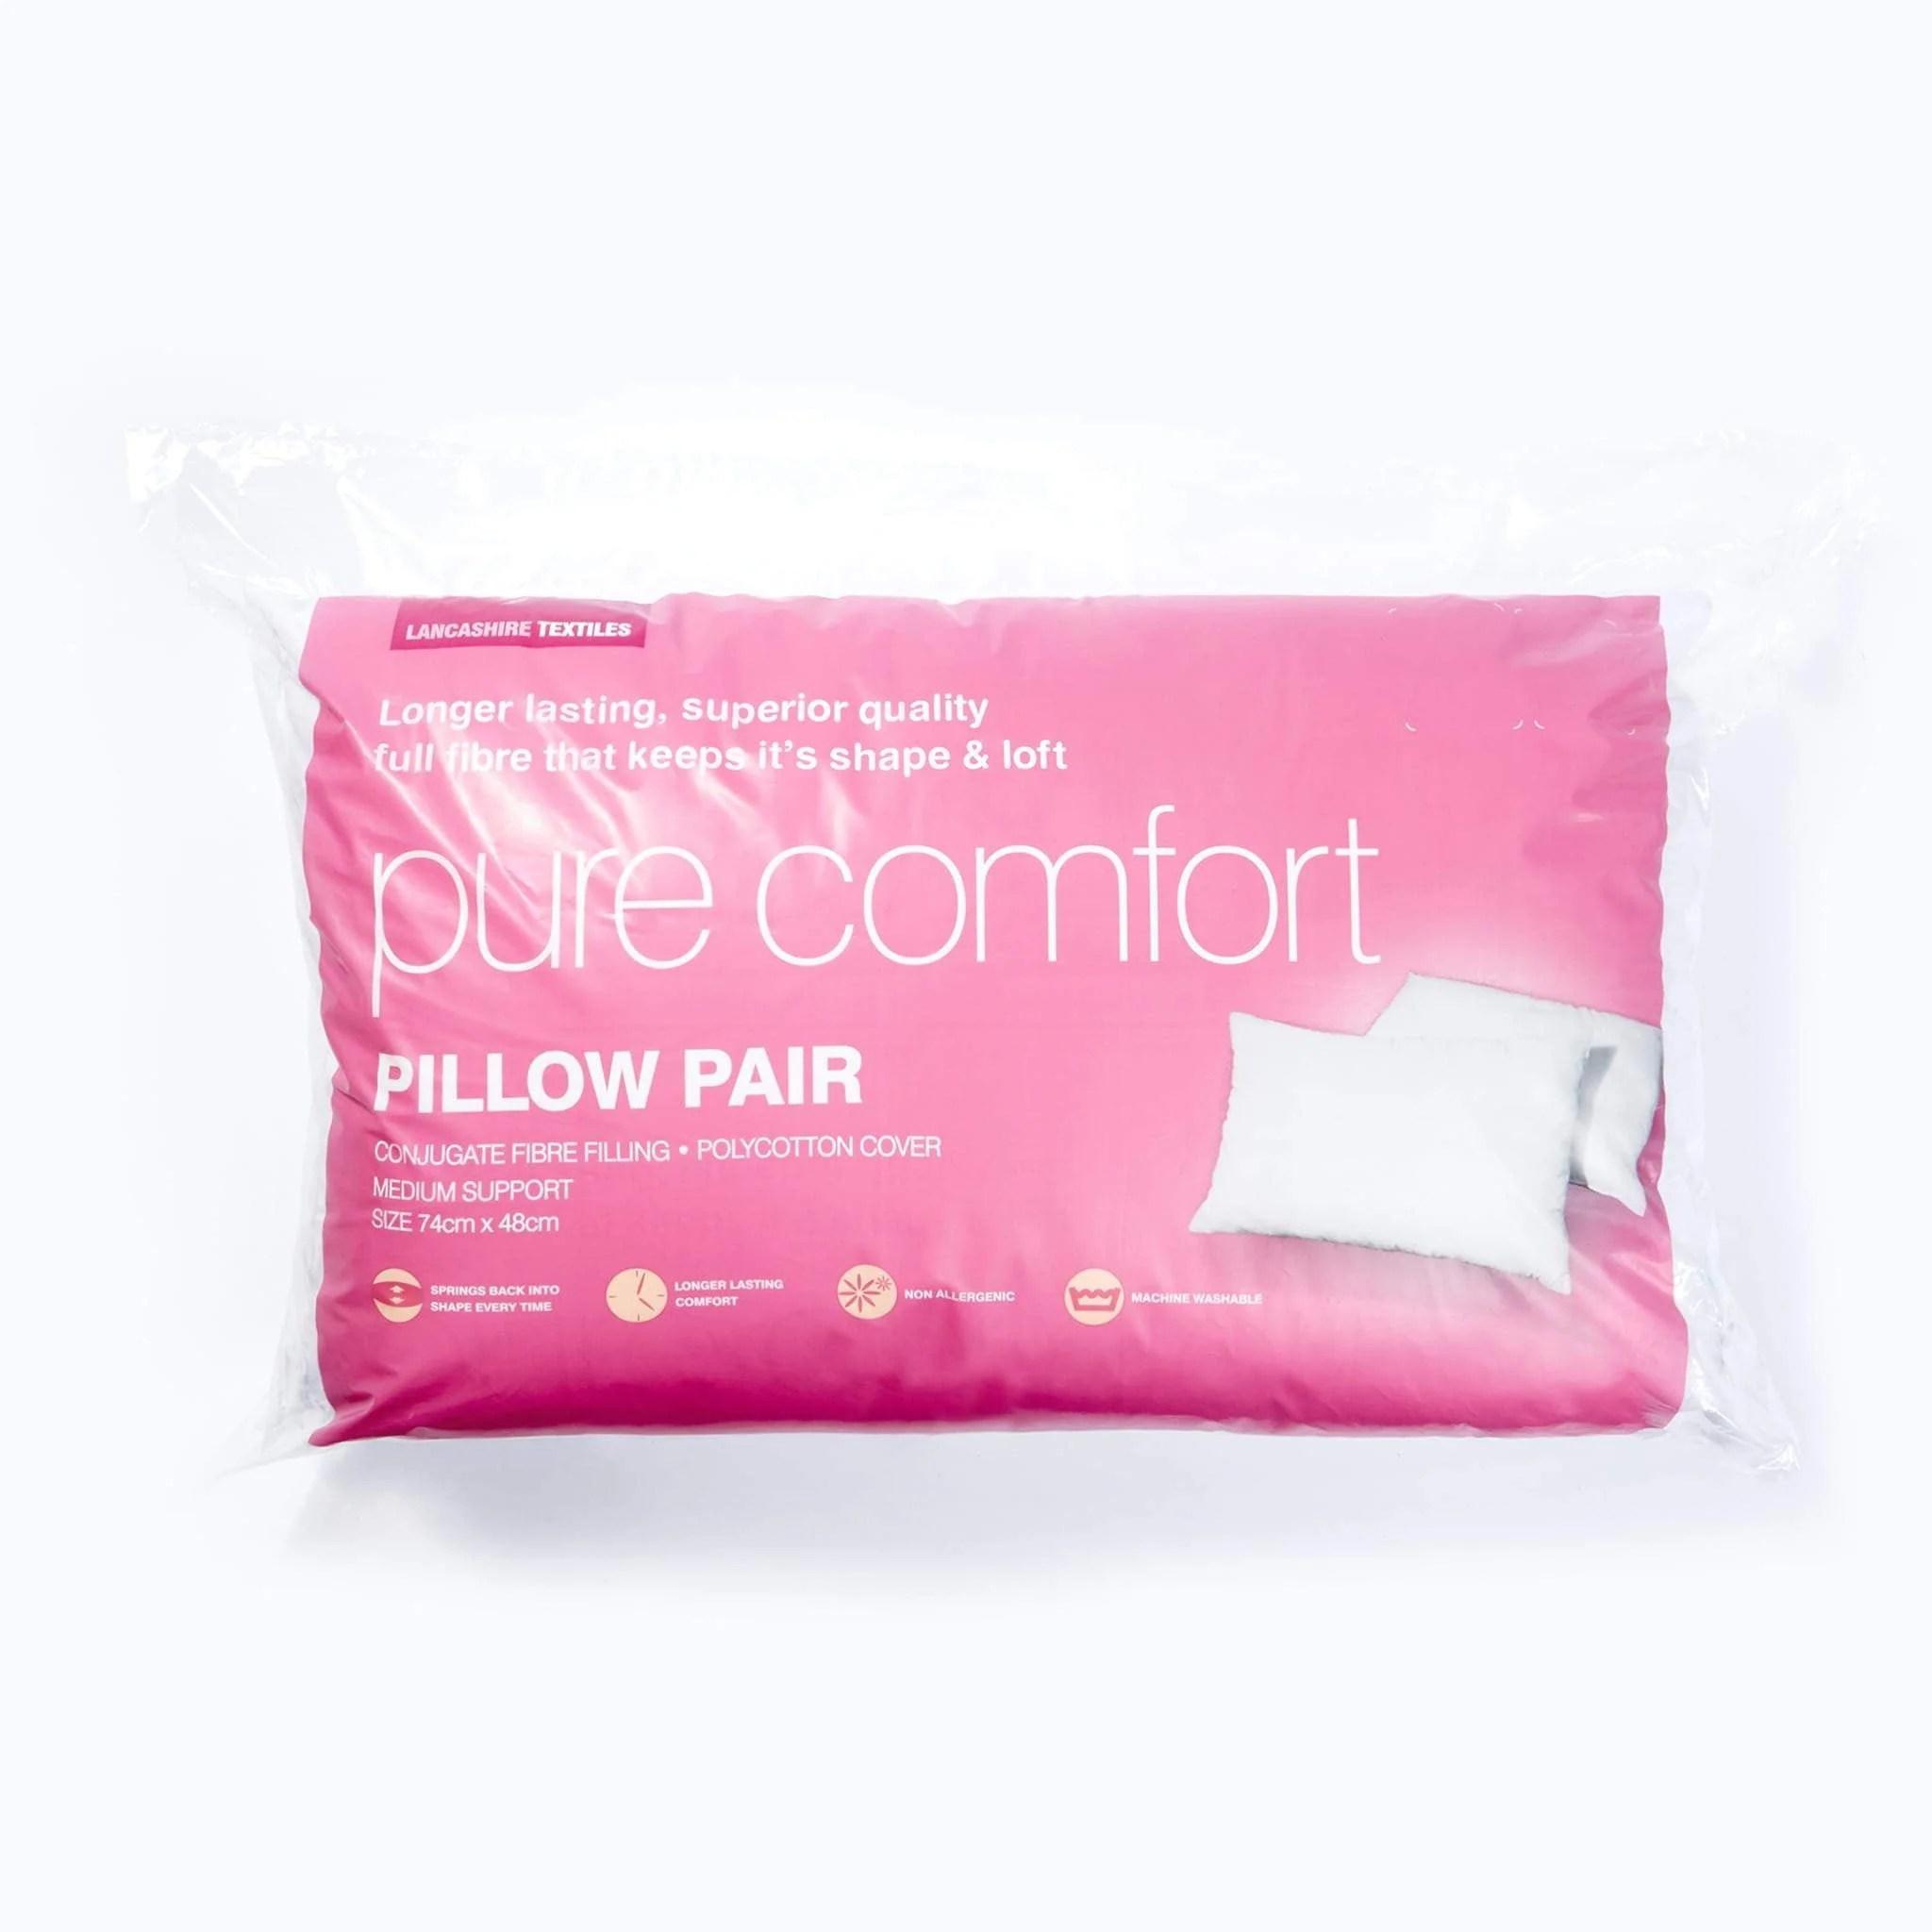 pure comfort pillow pair